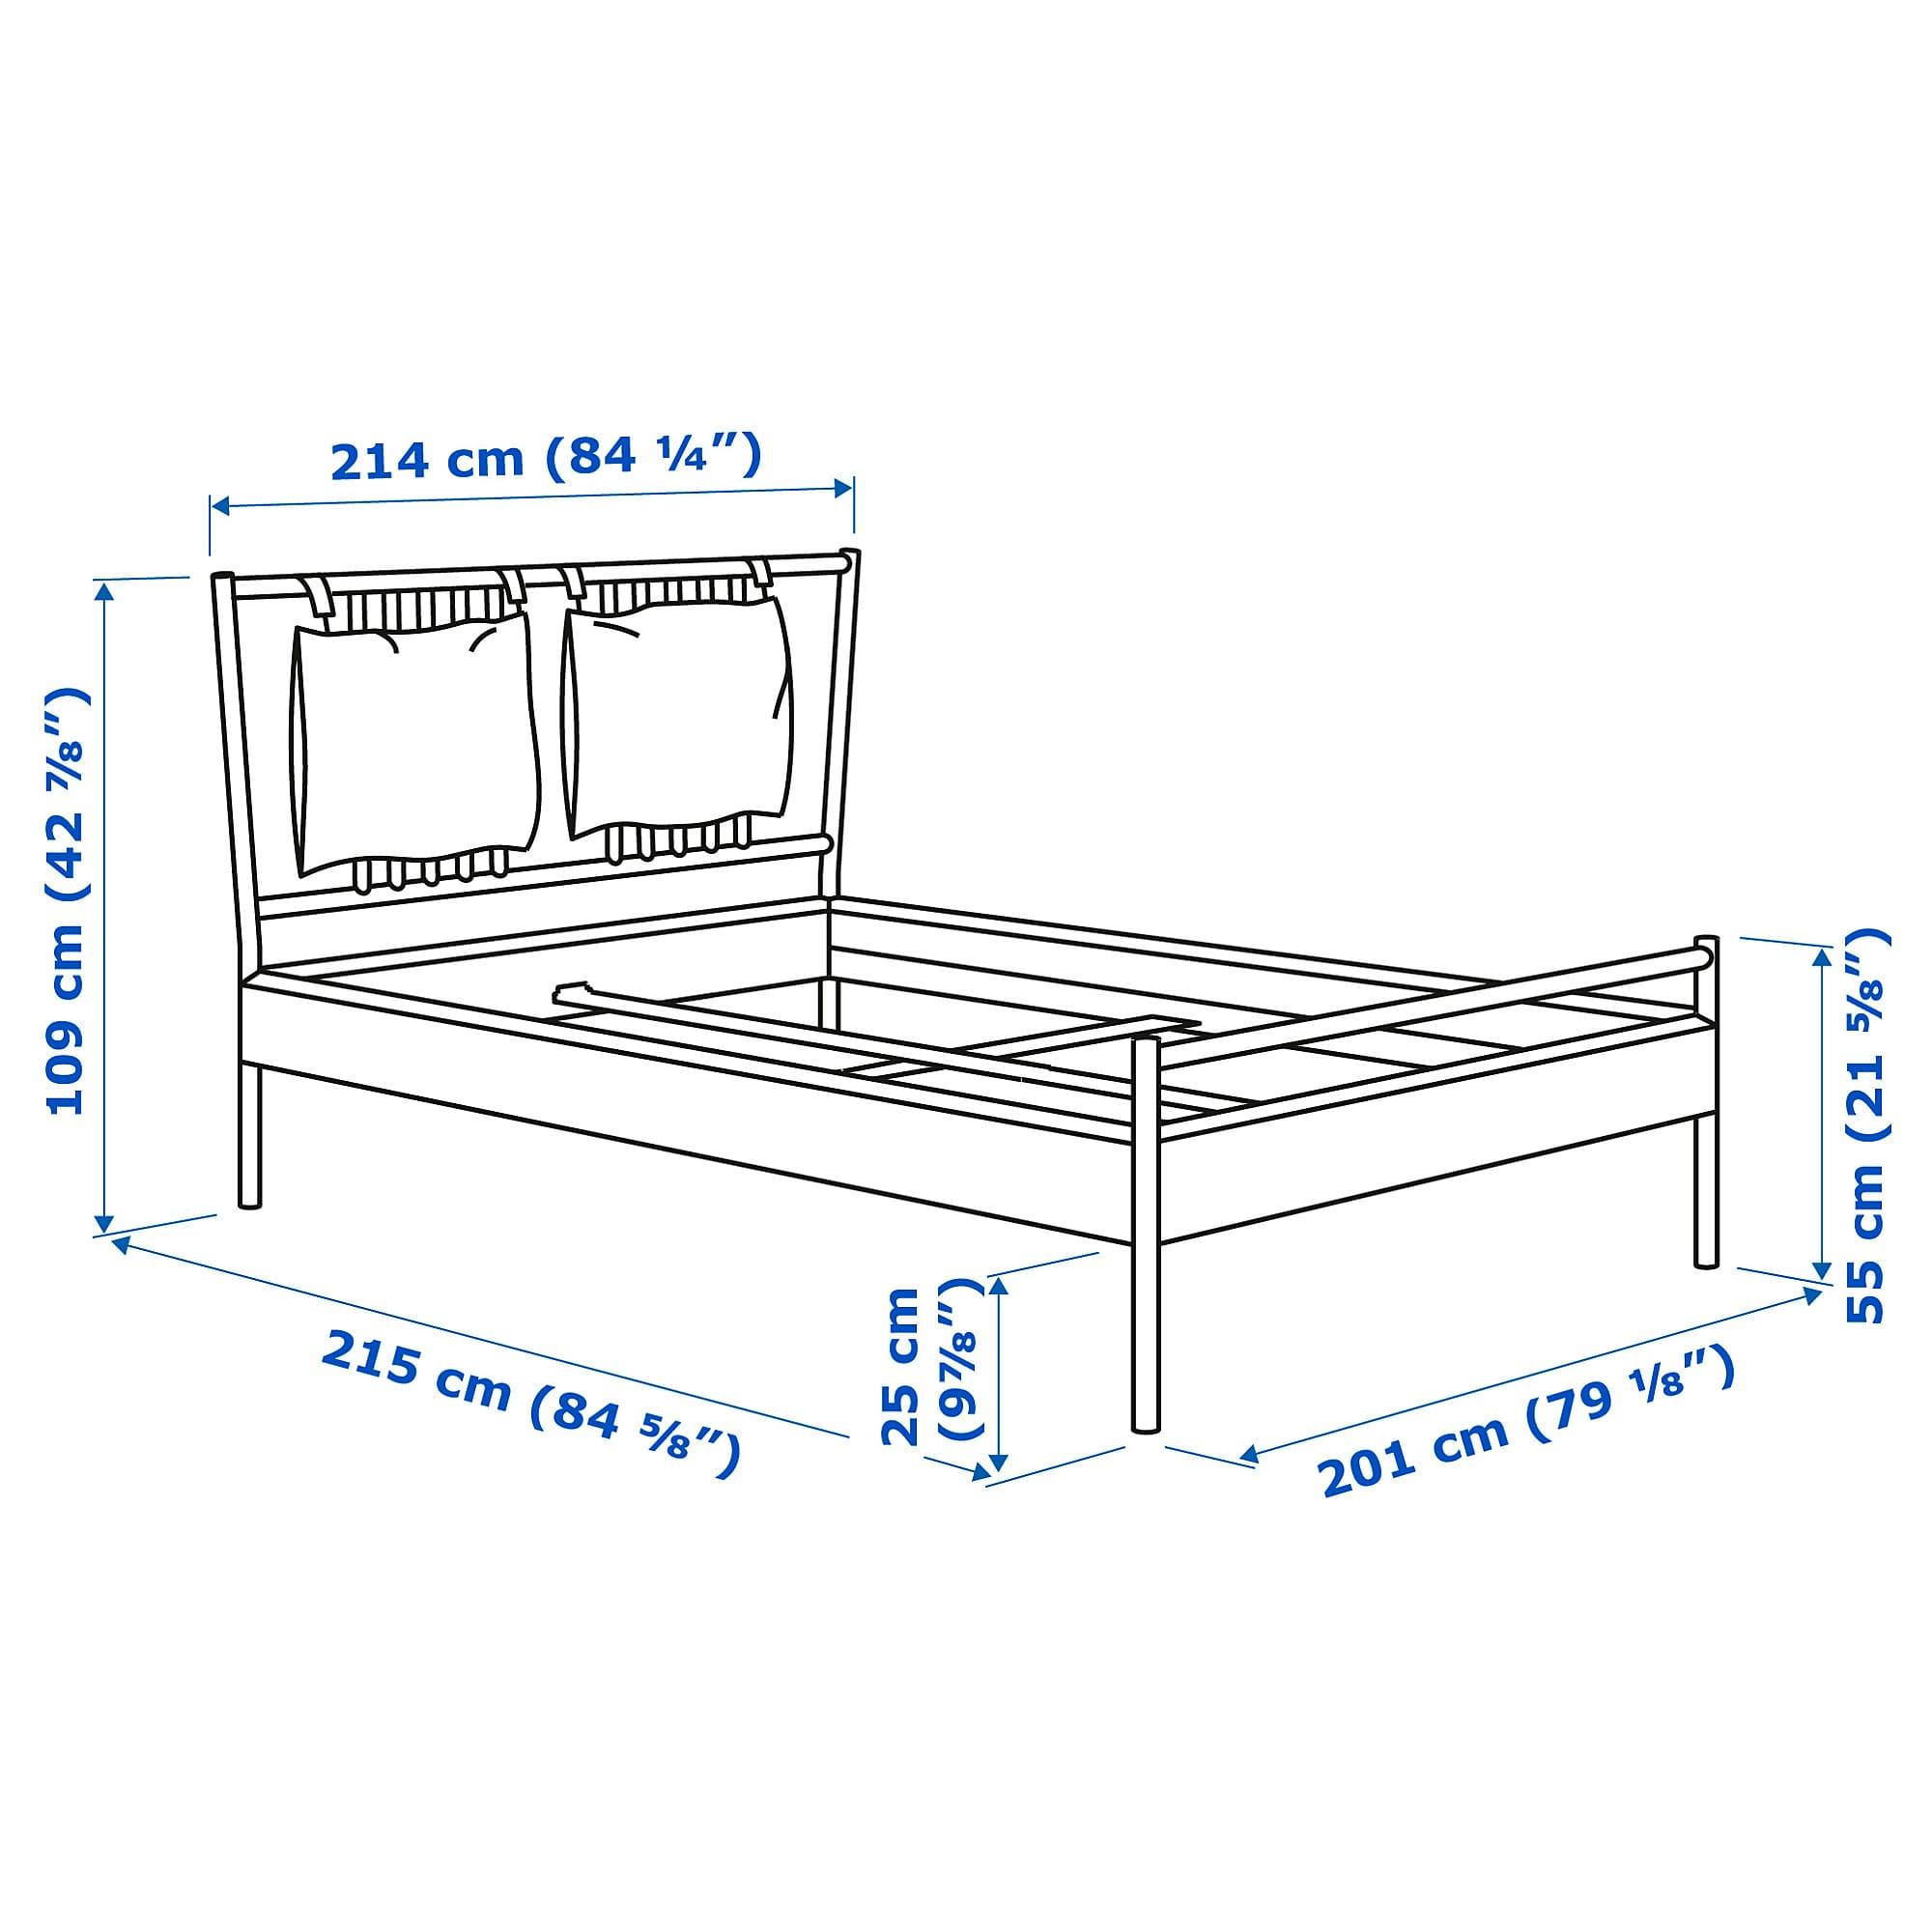 BJÖRKSNÄS Bed frame birch, Luröy King Bed frame, Birch